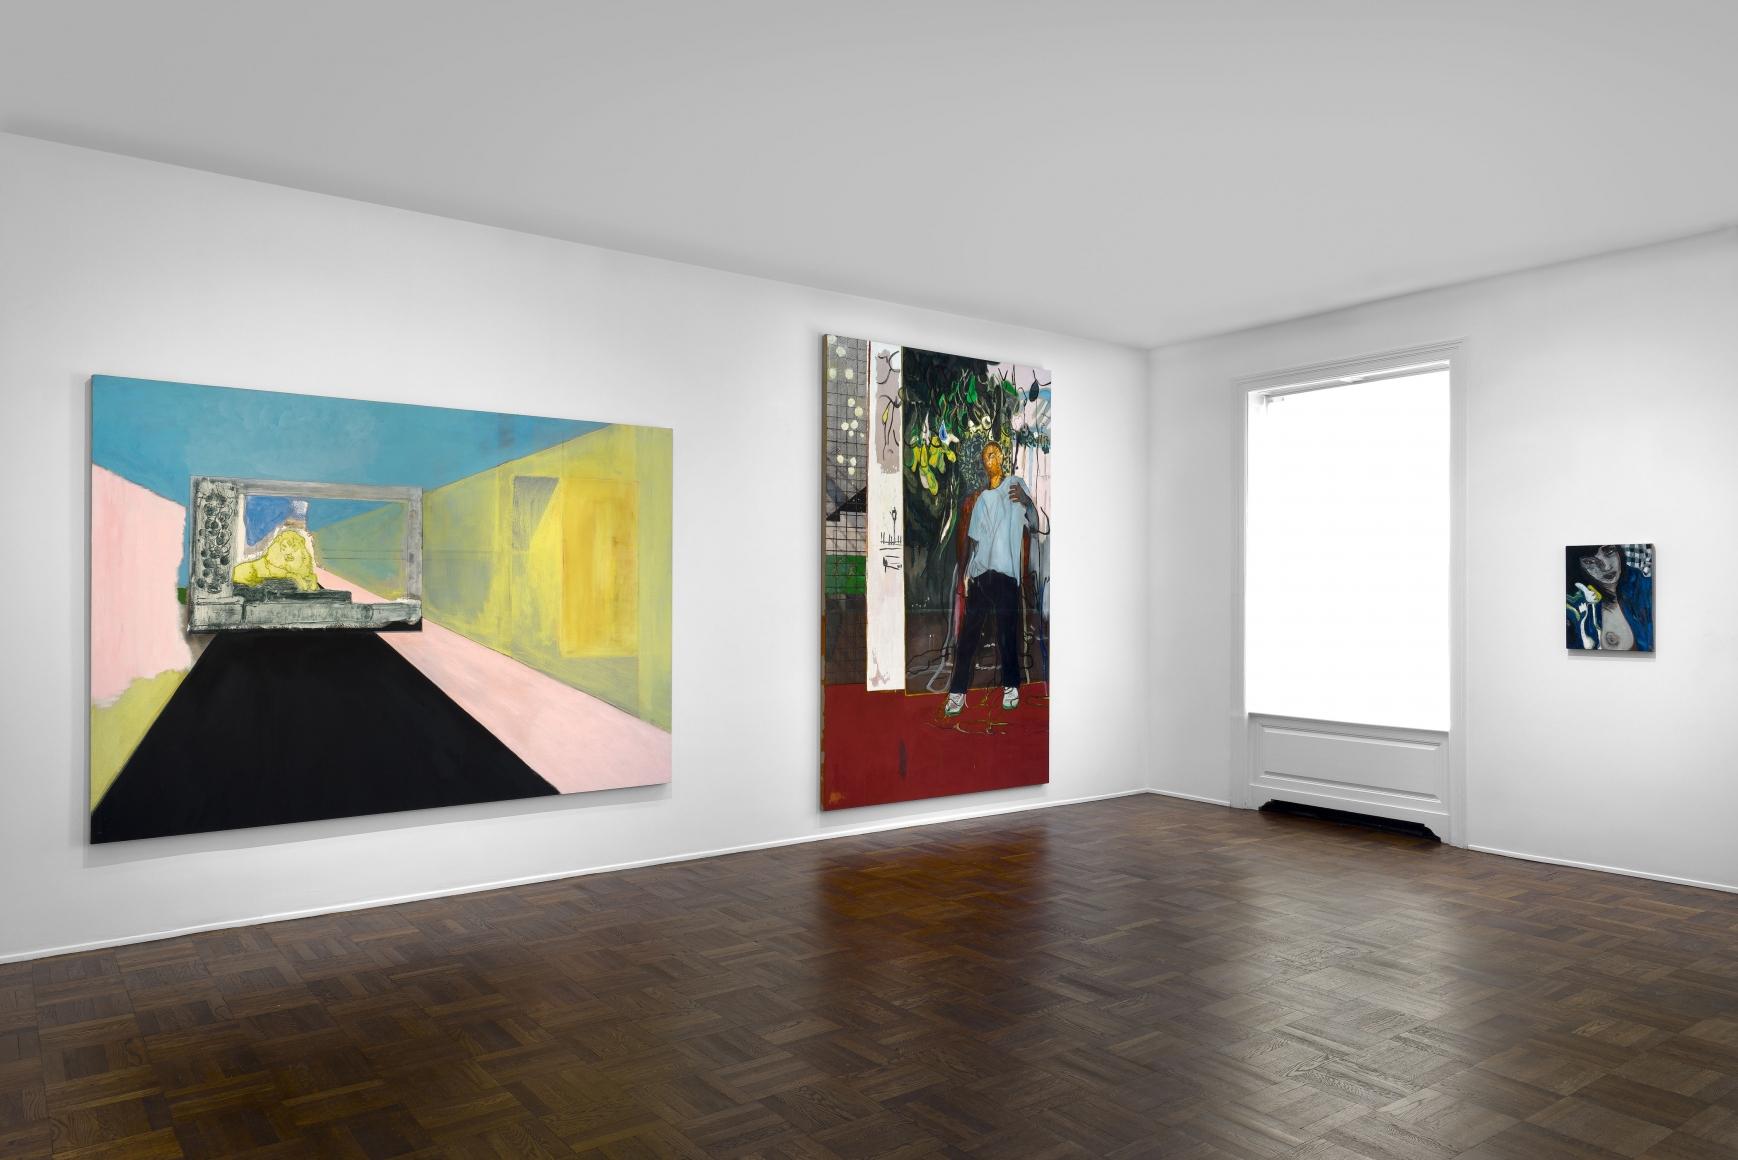 Peter Doig, New York, 2015, Installation Image 5